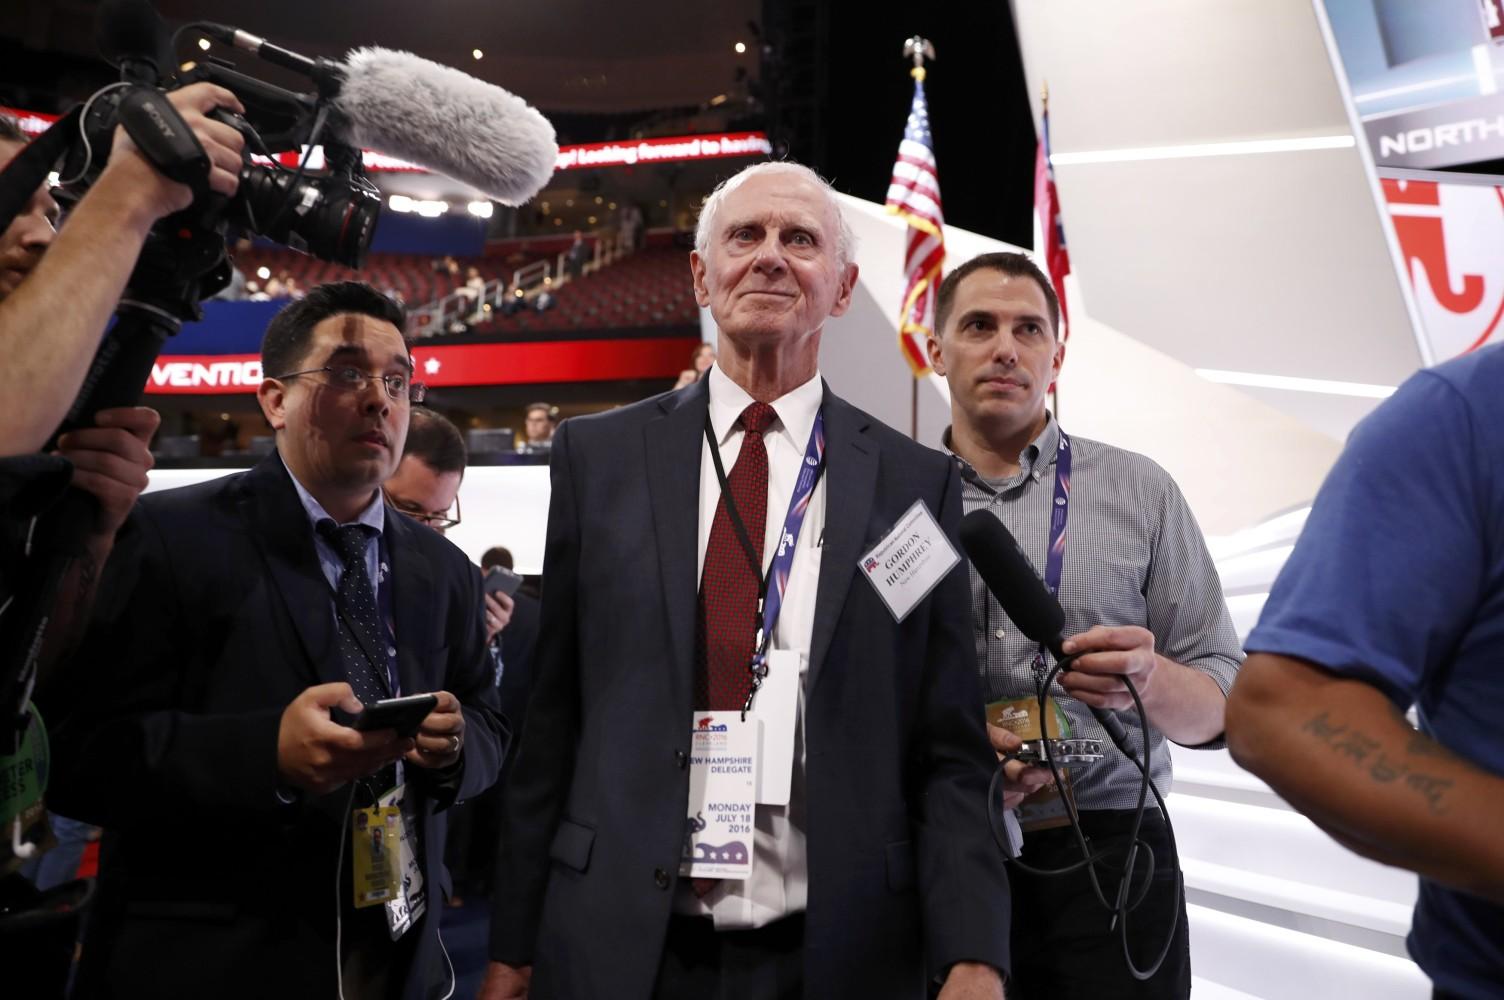 Wisconsin delegates disappointed in Cruz, await Trump